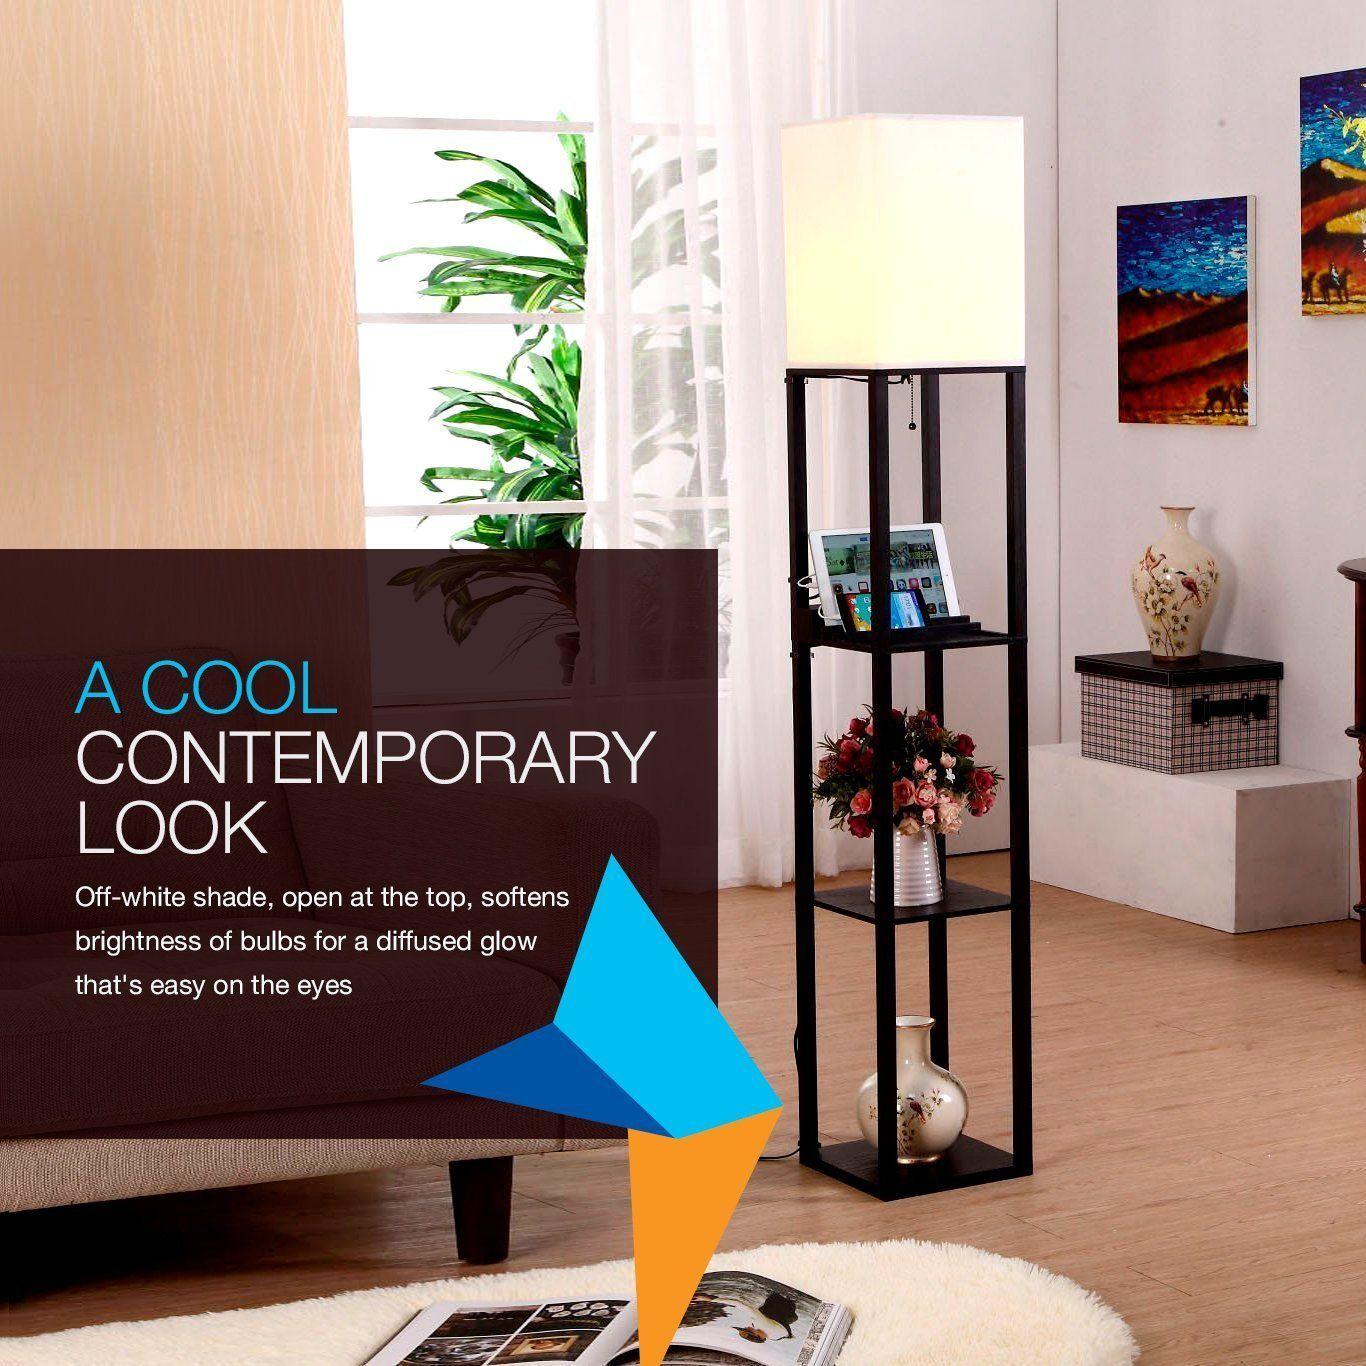 Home Improvement Bathroom Hardware Led Shelf Floor Lamp Modern Standing Light Display Shelves For Living Rooms Bedrooms